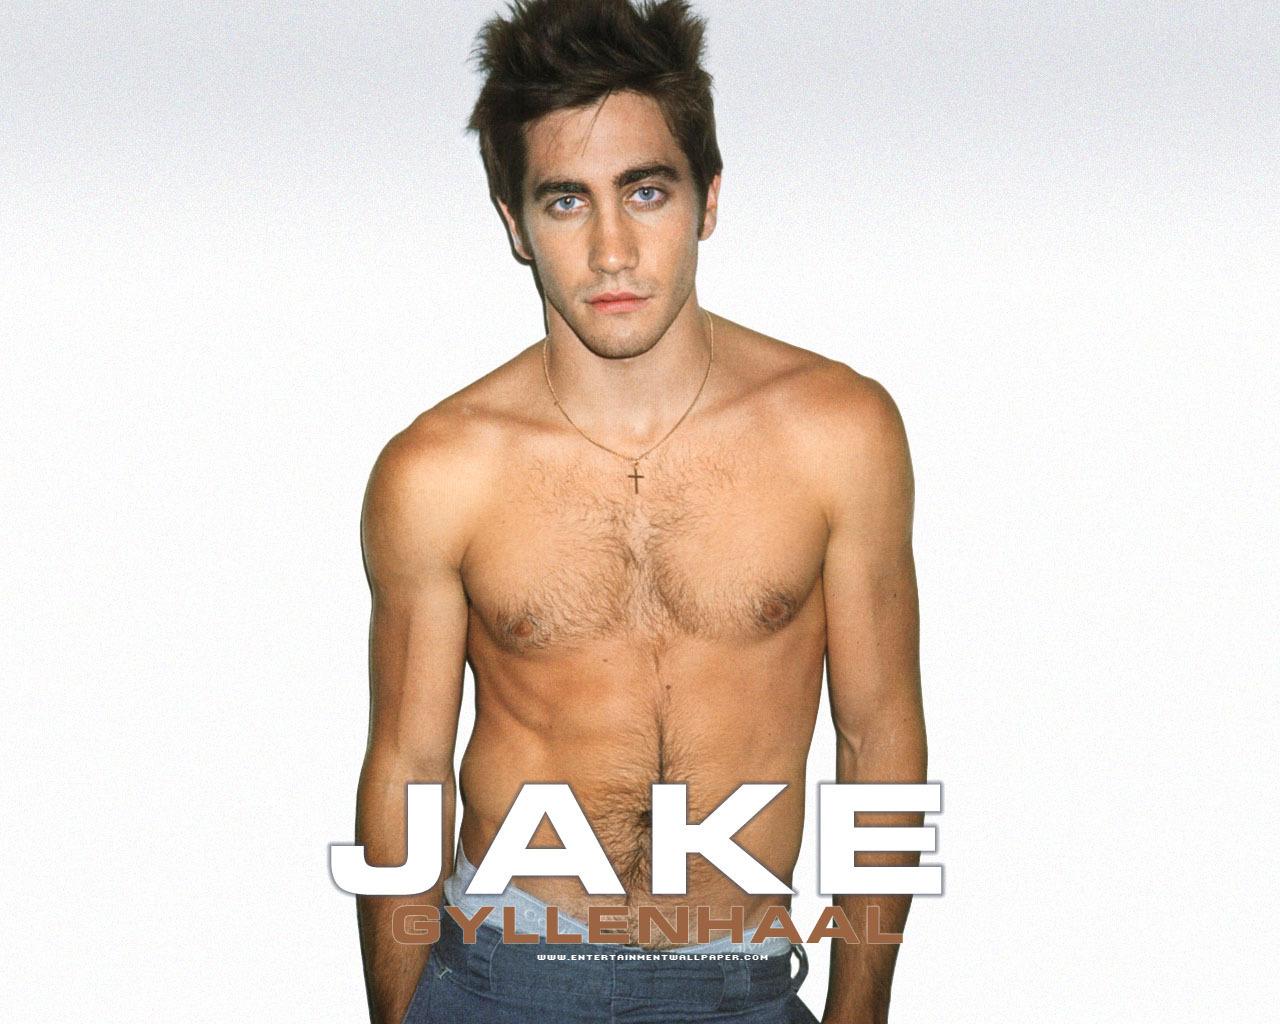 http://3.bp.blogspot.com/-70az2BljXj8/Tv6ZUgjwNNI/AAAAAAAAL5A/lV7Vl2l06Oo/s1600/Foto-Foto-Jake-Gyllenhaal-36.jpg